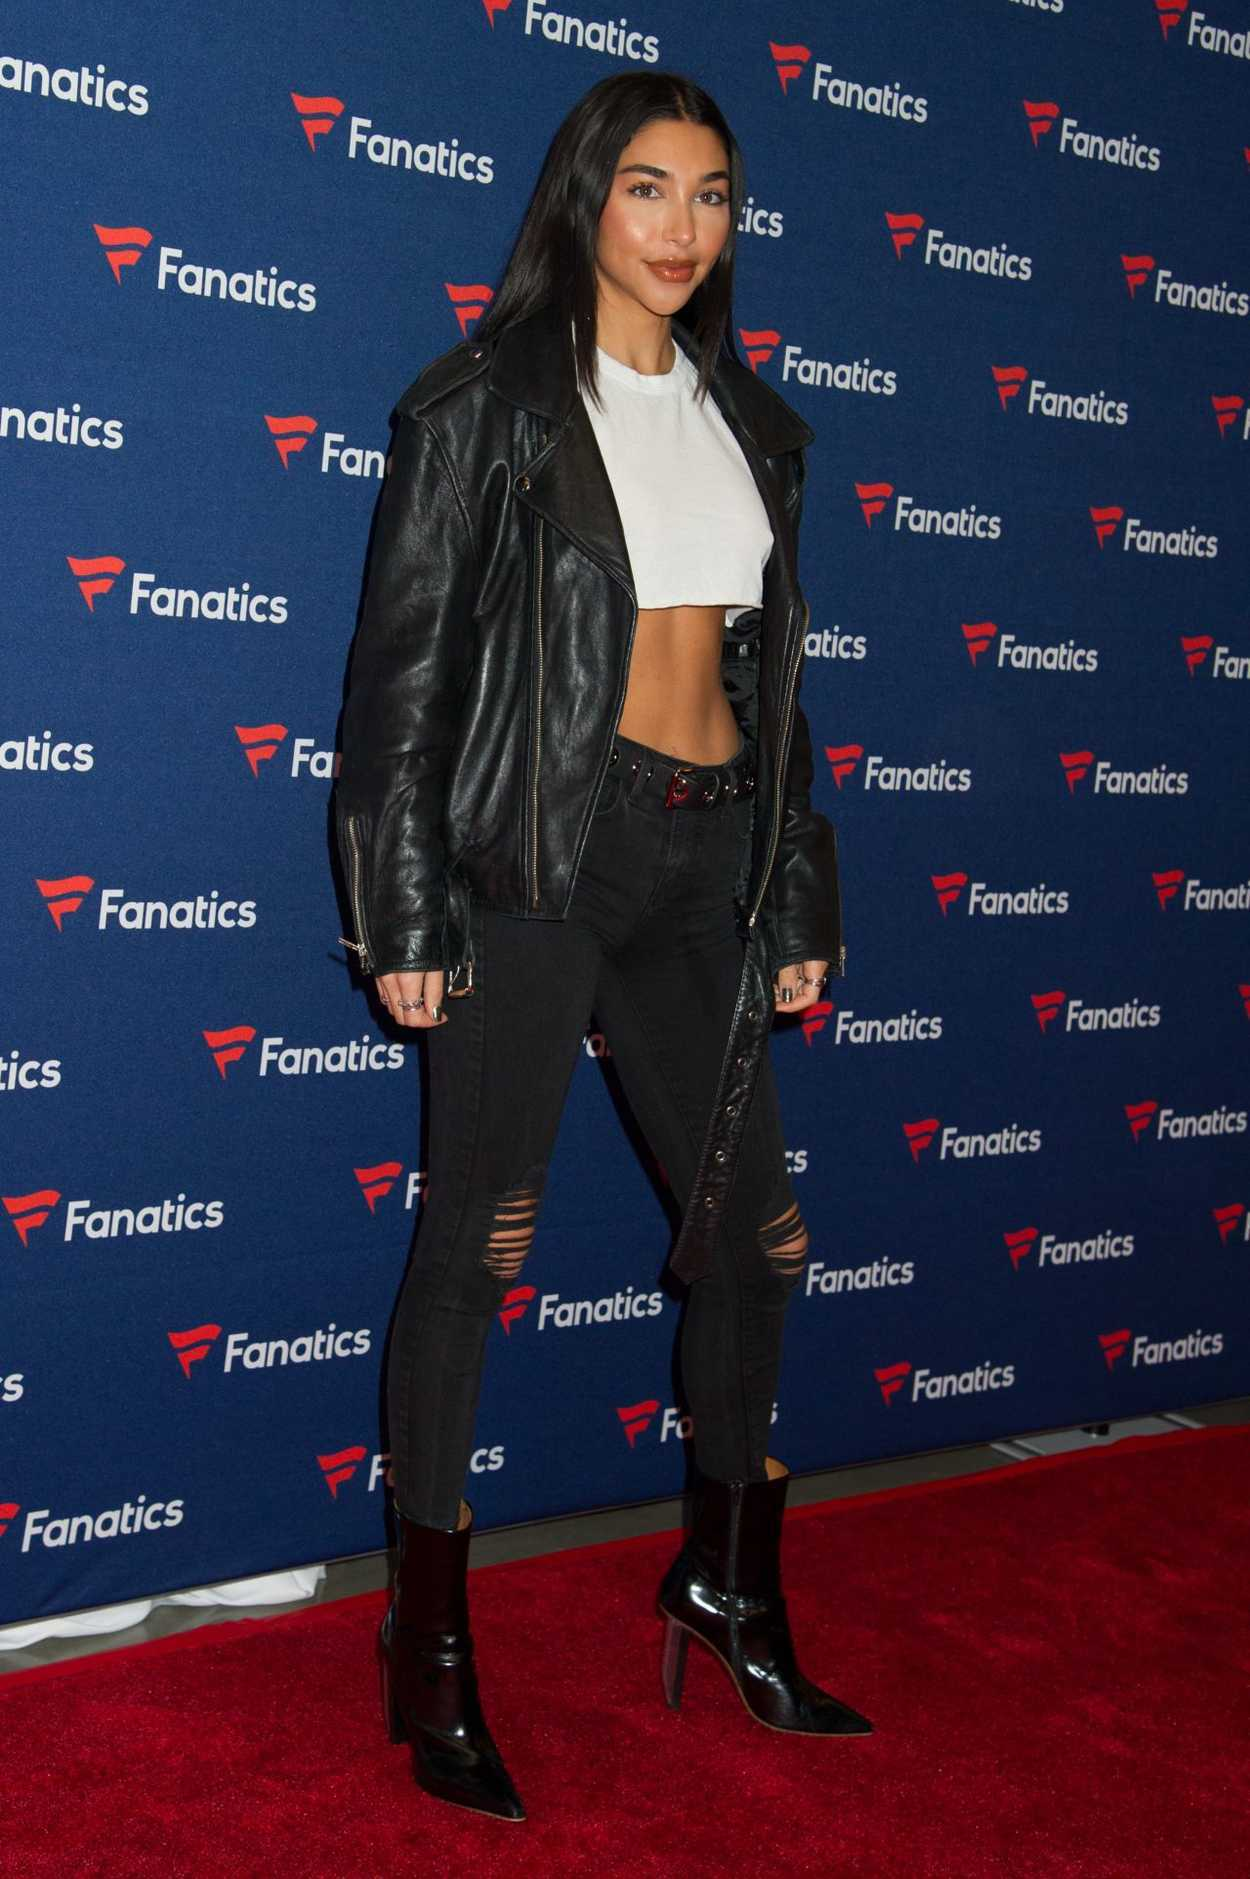 Daleela Echahly Street Fashion: Chantel Jeffries Attends Fanatics Super Bowl Party In